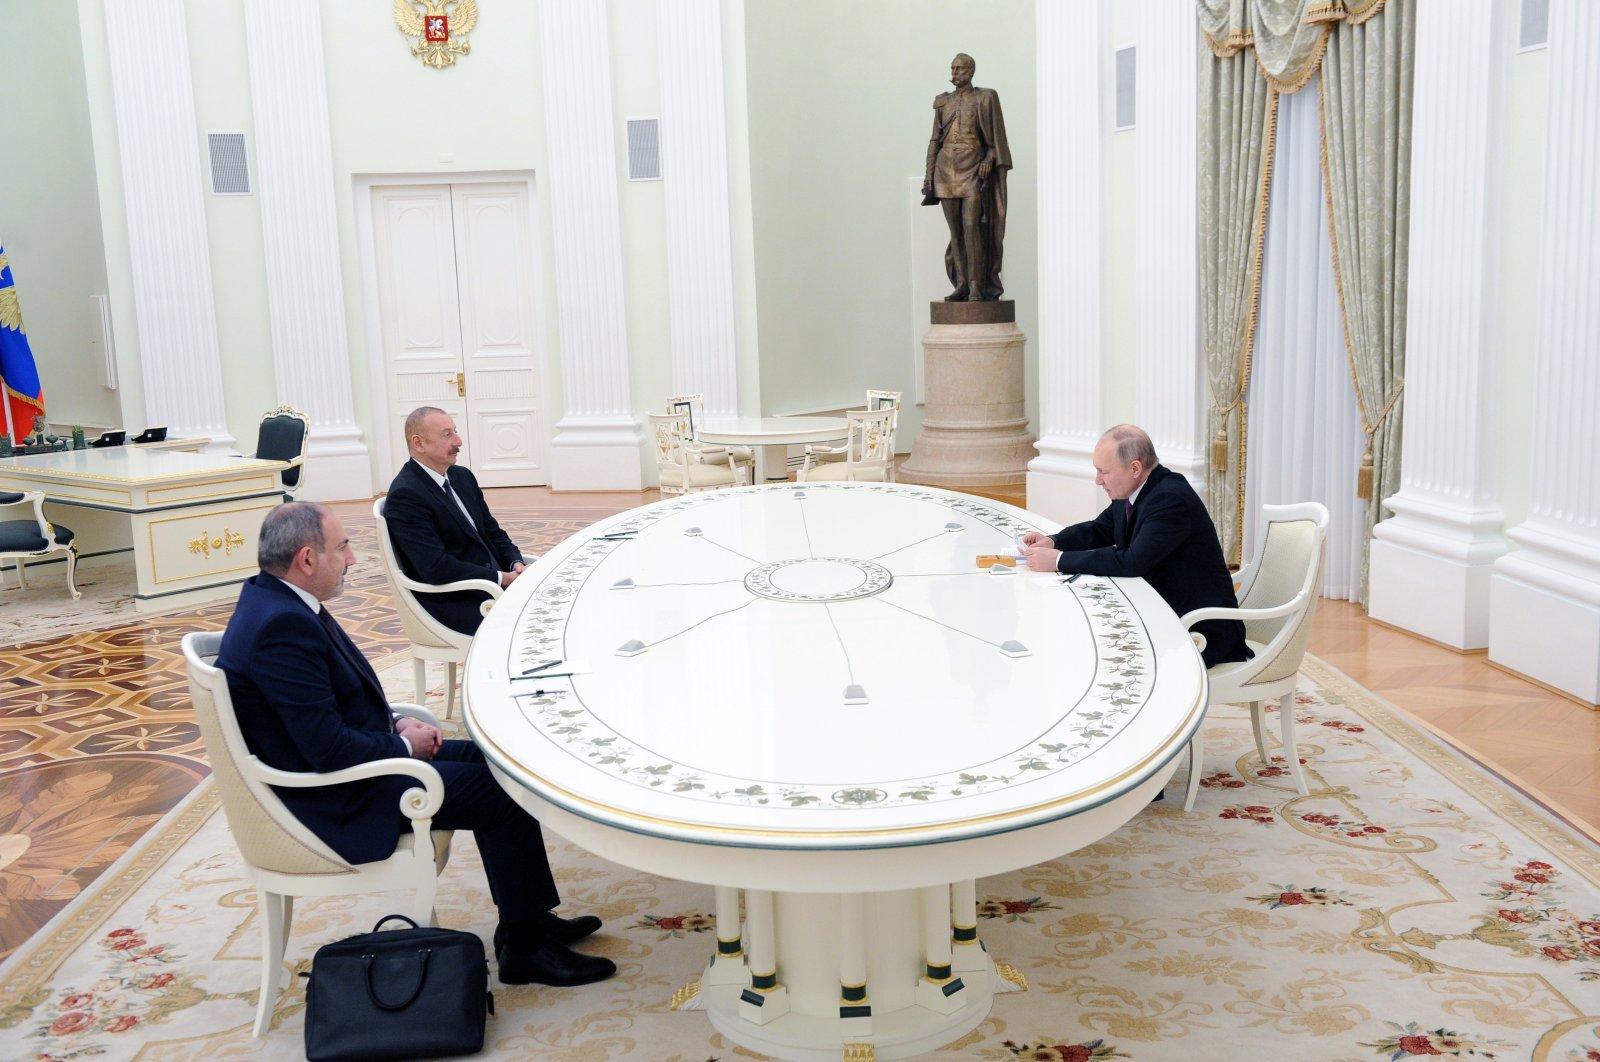 Liberation of Karabakh paves way for regional development: Expert